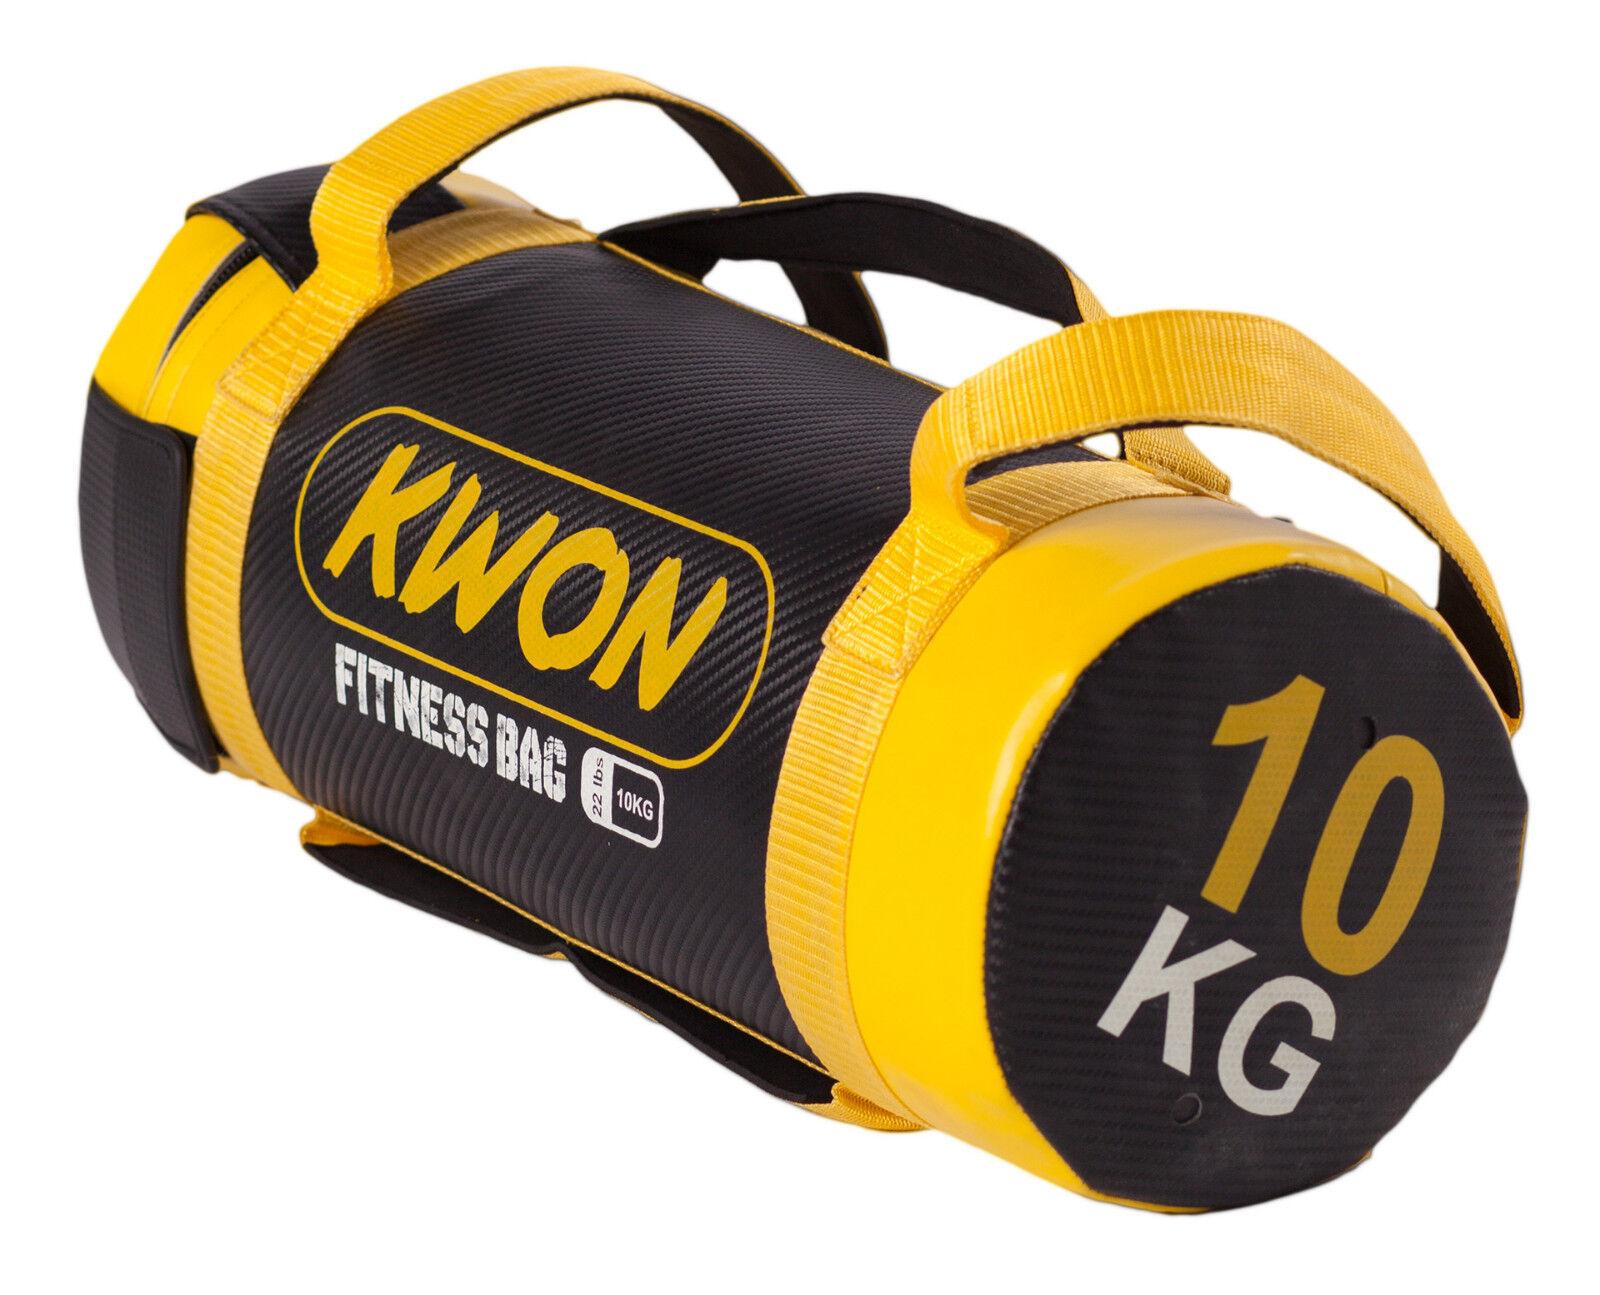 Kwon- Kwon- Kwon- Fitnessrolle 10kg. Functional Fitness. Zirkel. Ringen. Grappling. Judo.ect 740799